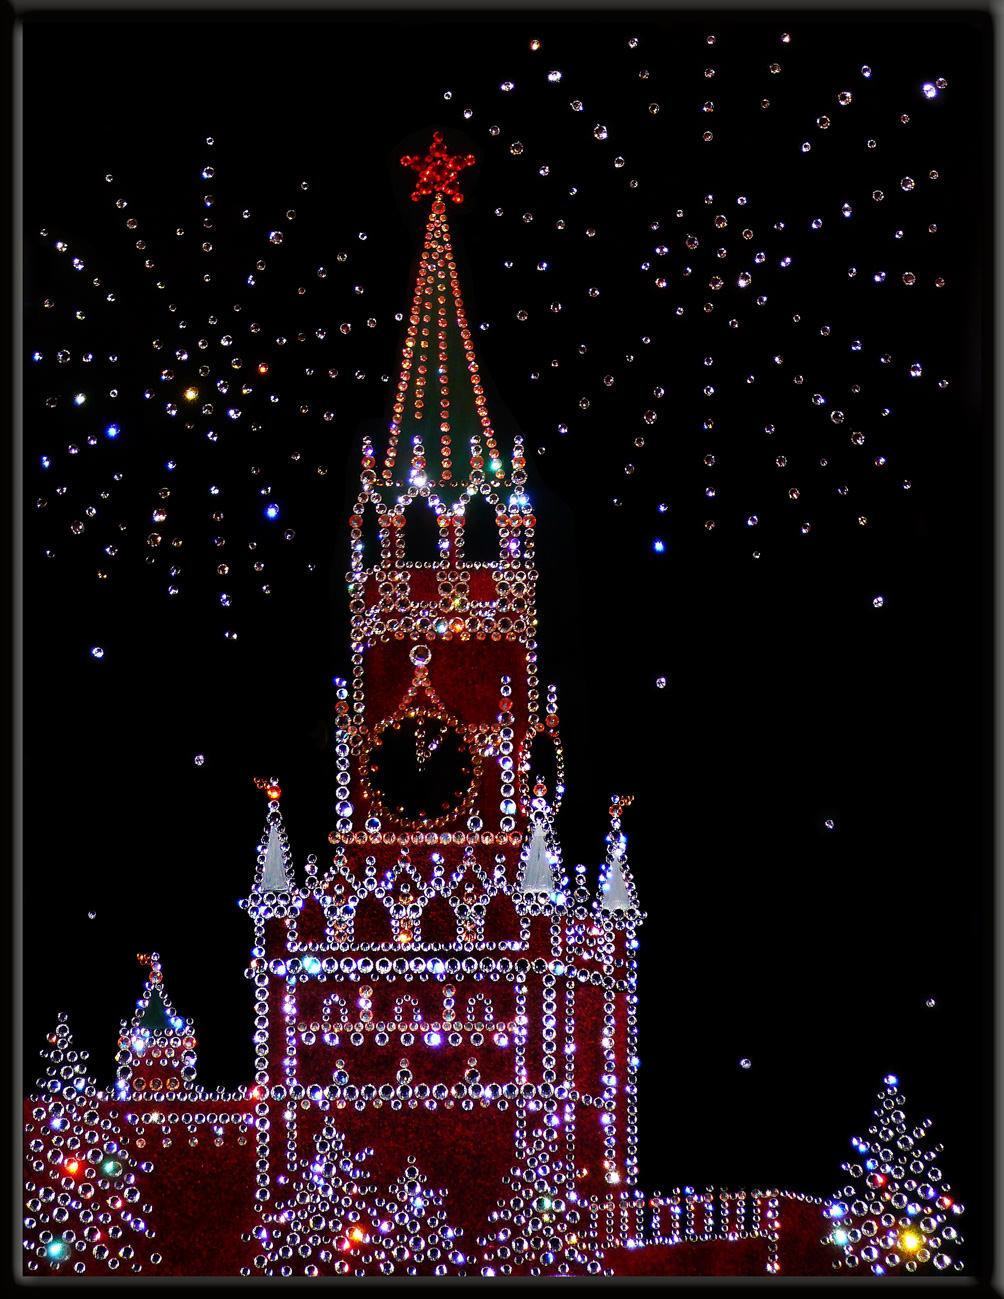 Москва анимация картинки, февраля